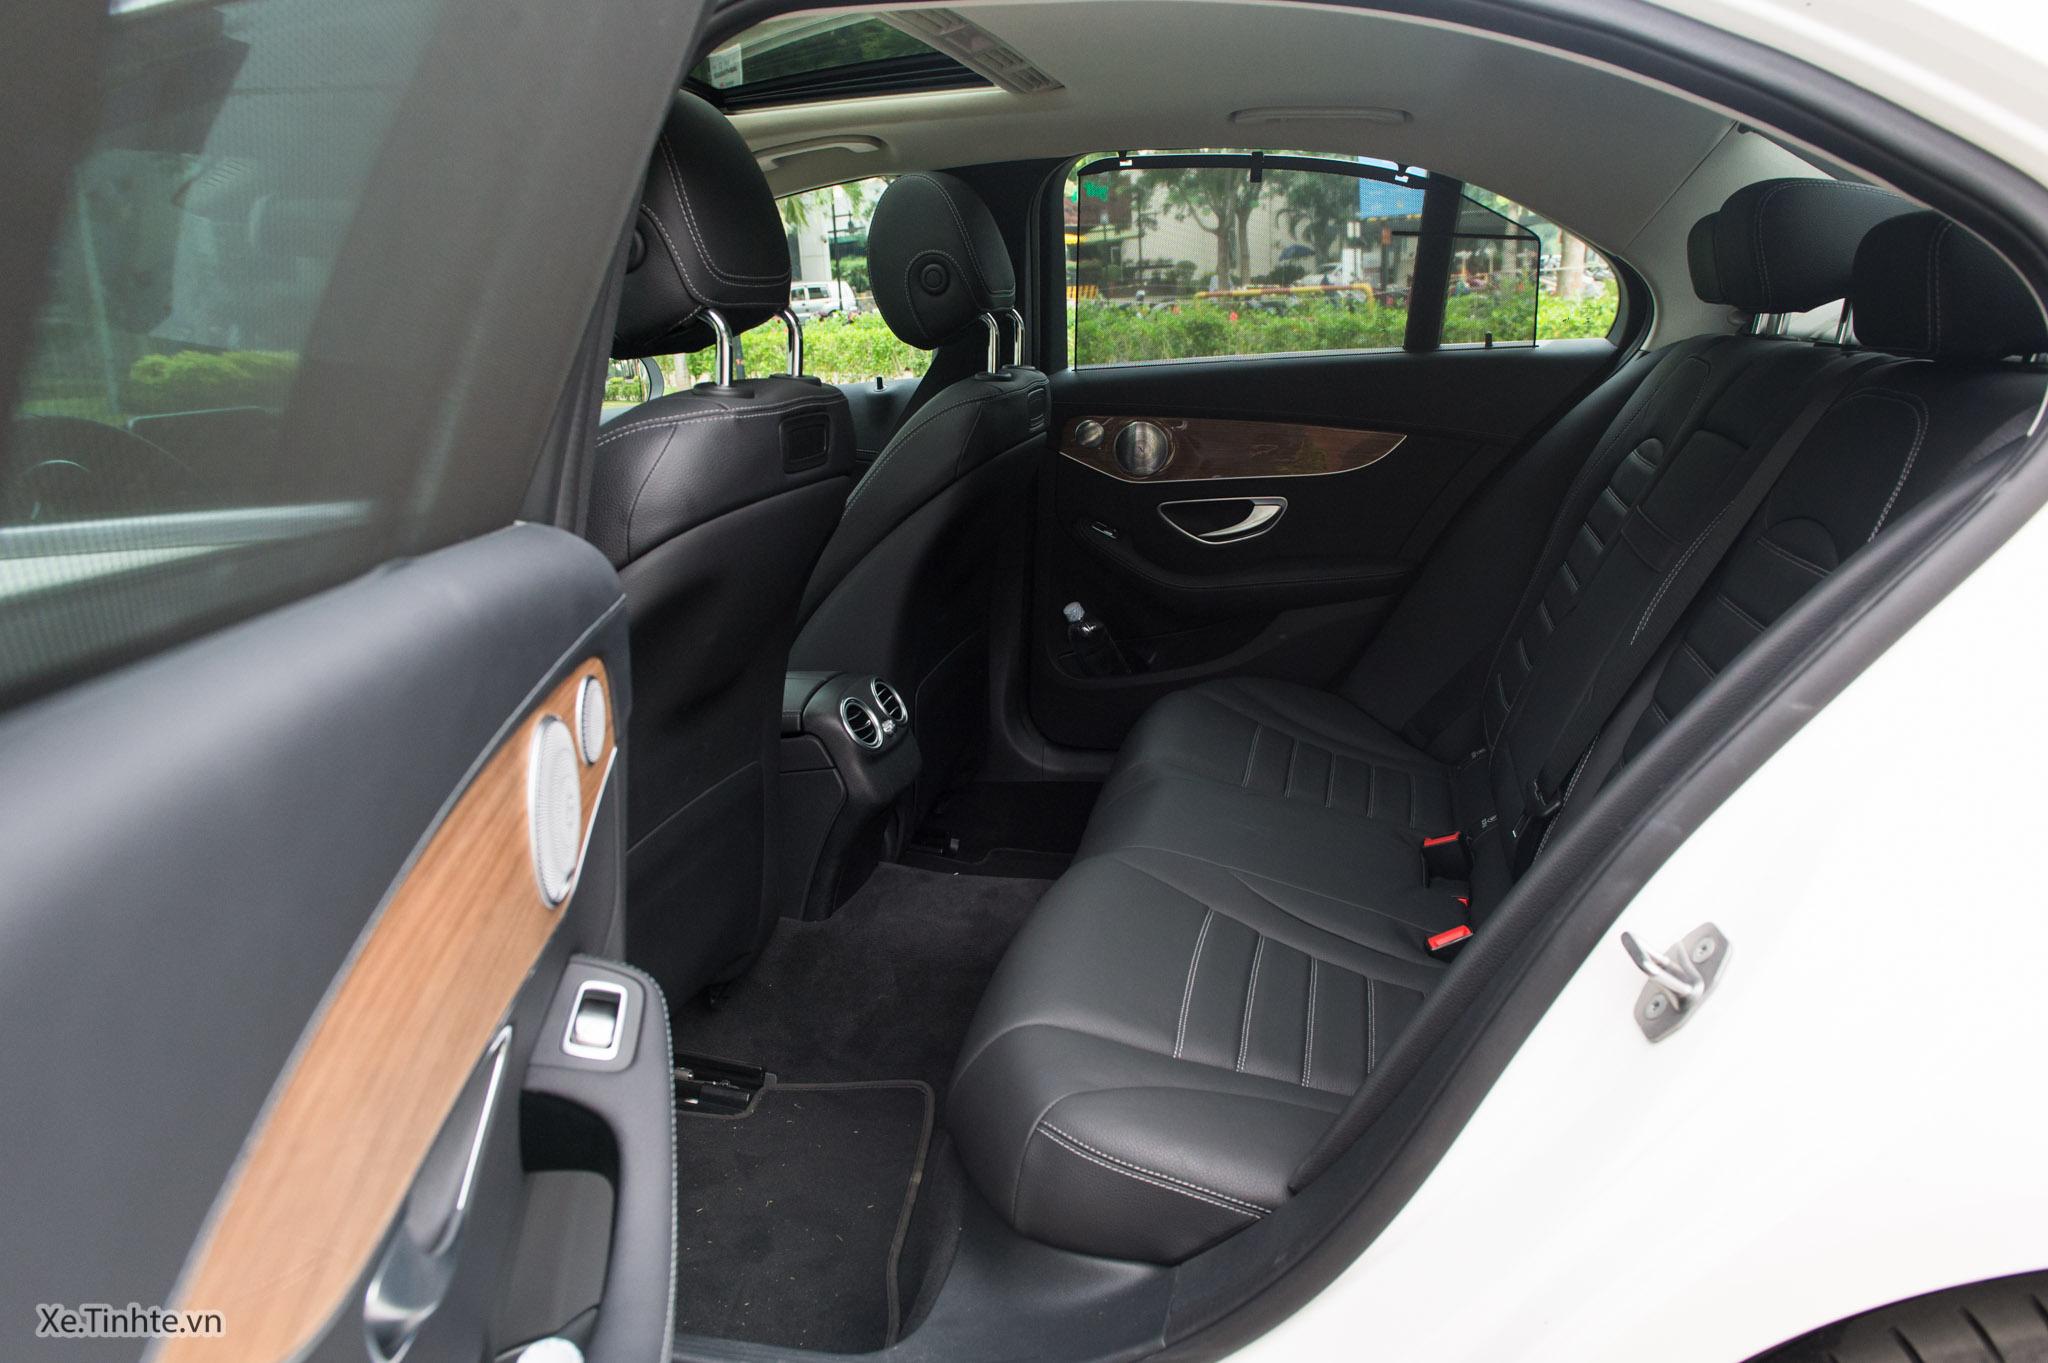 Mercedes_C250 Exclusive_Xe.tinhte.vn-7231.jpg